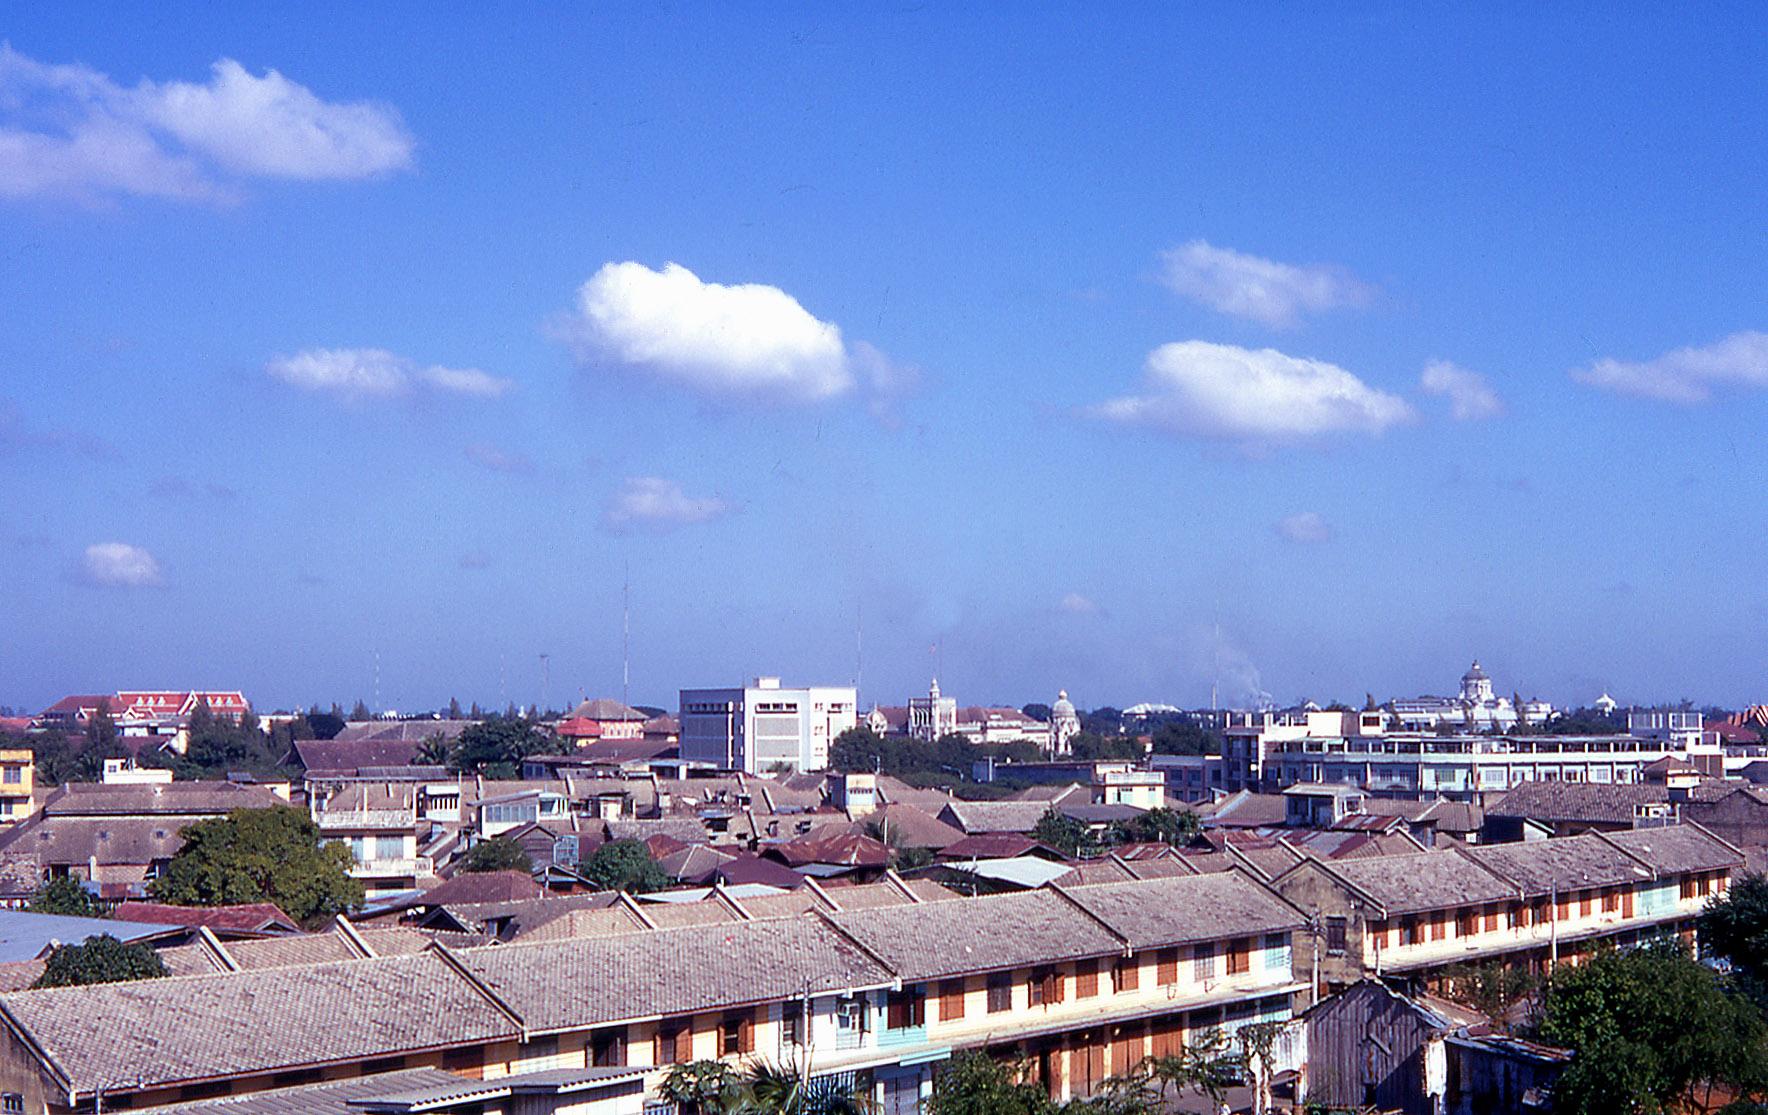 1968 Bangkok Skyline 2 by Harry McCown.jpg